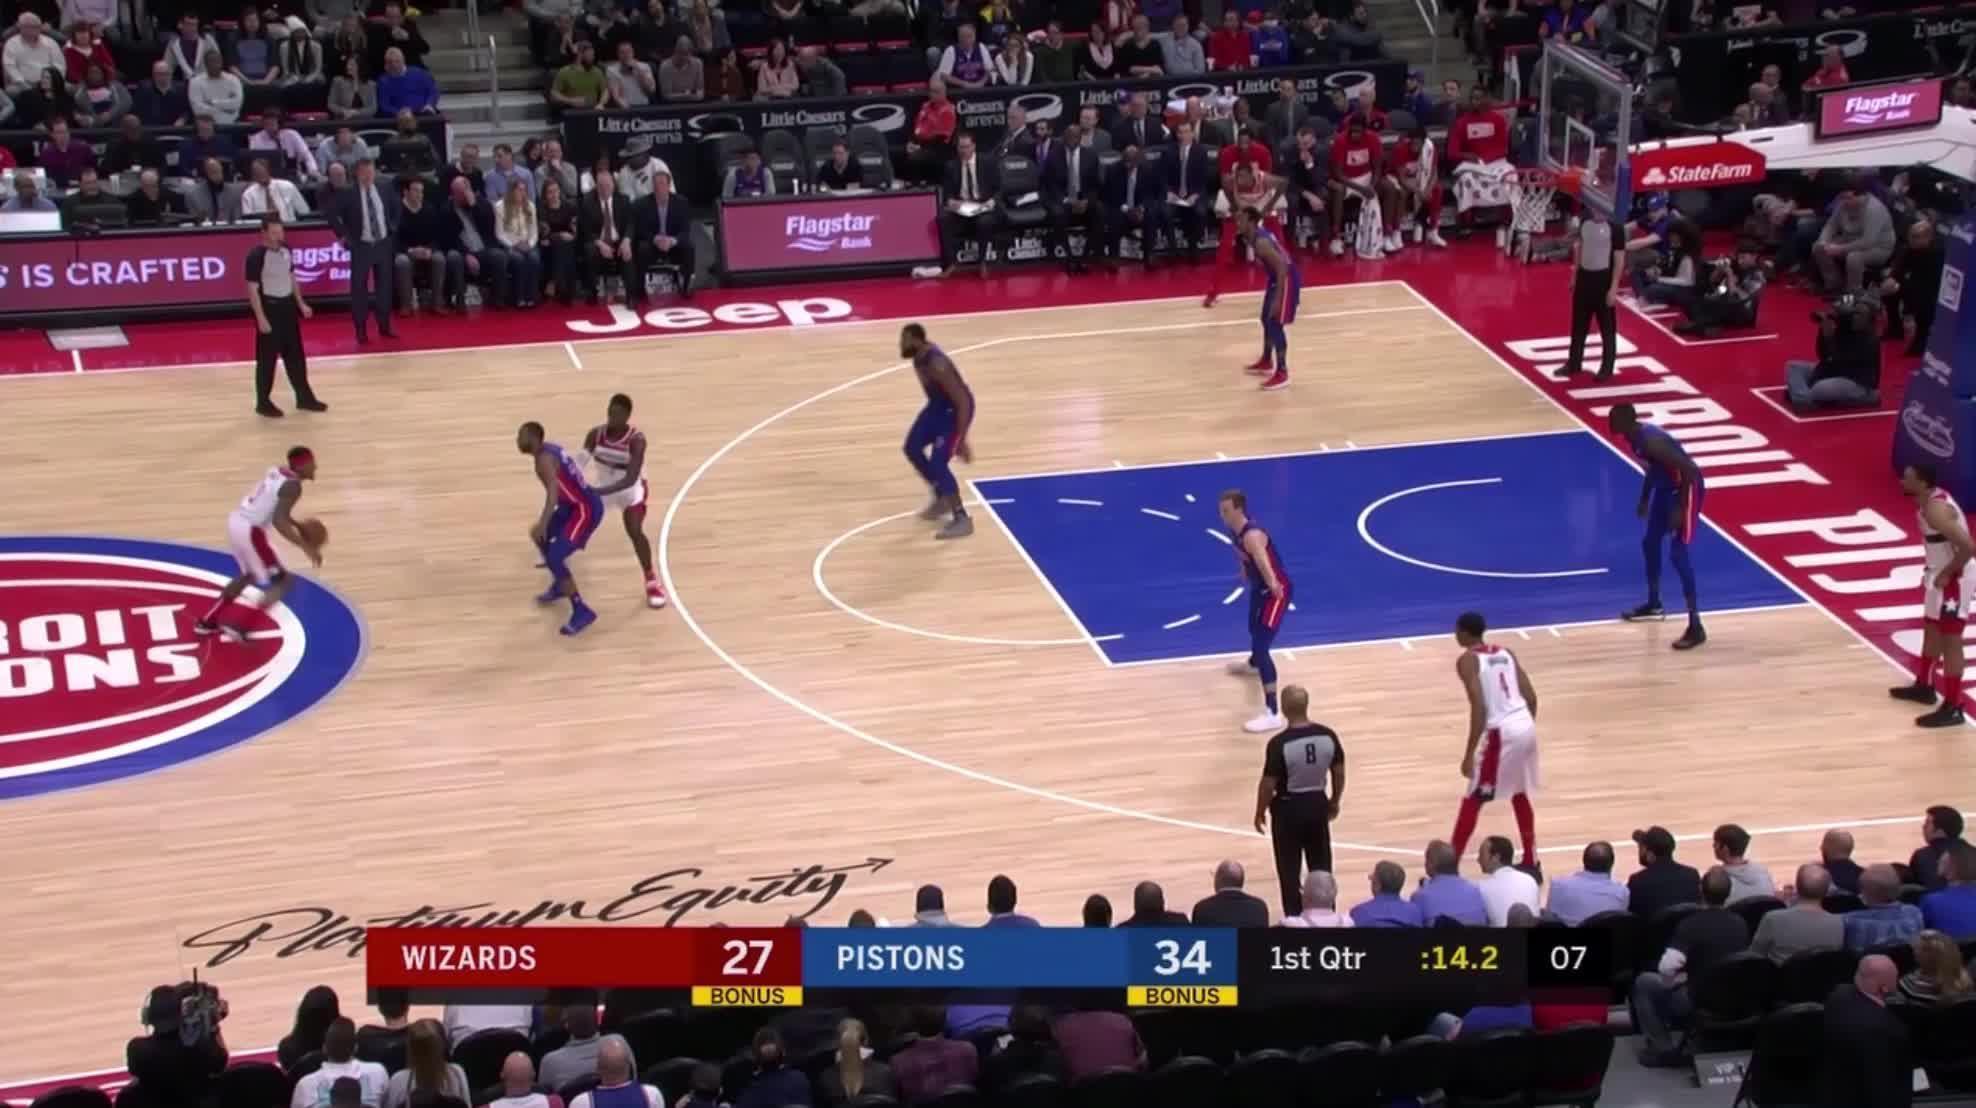 Detroit Pistons, Thon Maker, Washington Wizards, basketball, Thon Maker weakaside block Wiz GIFs